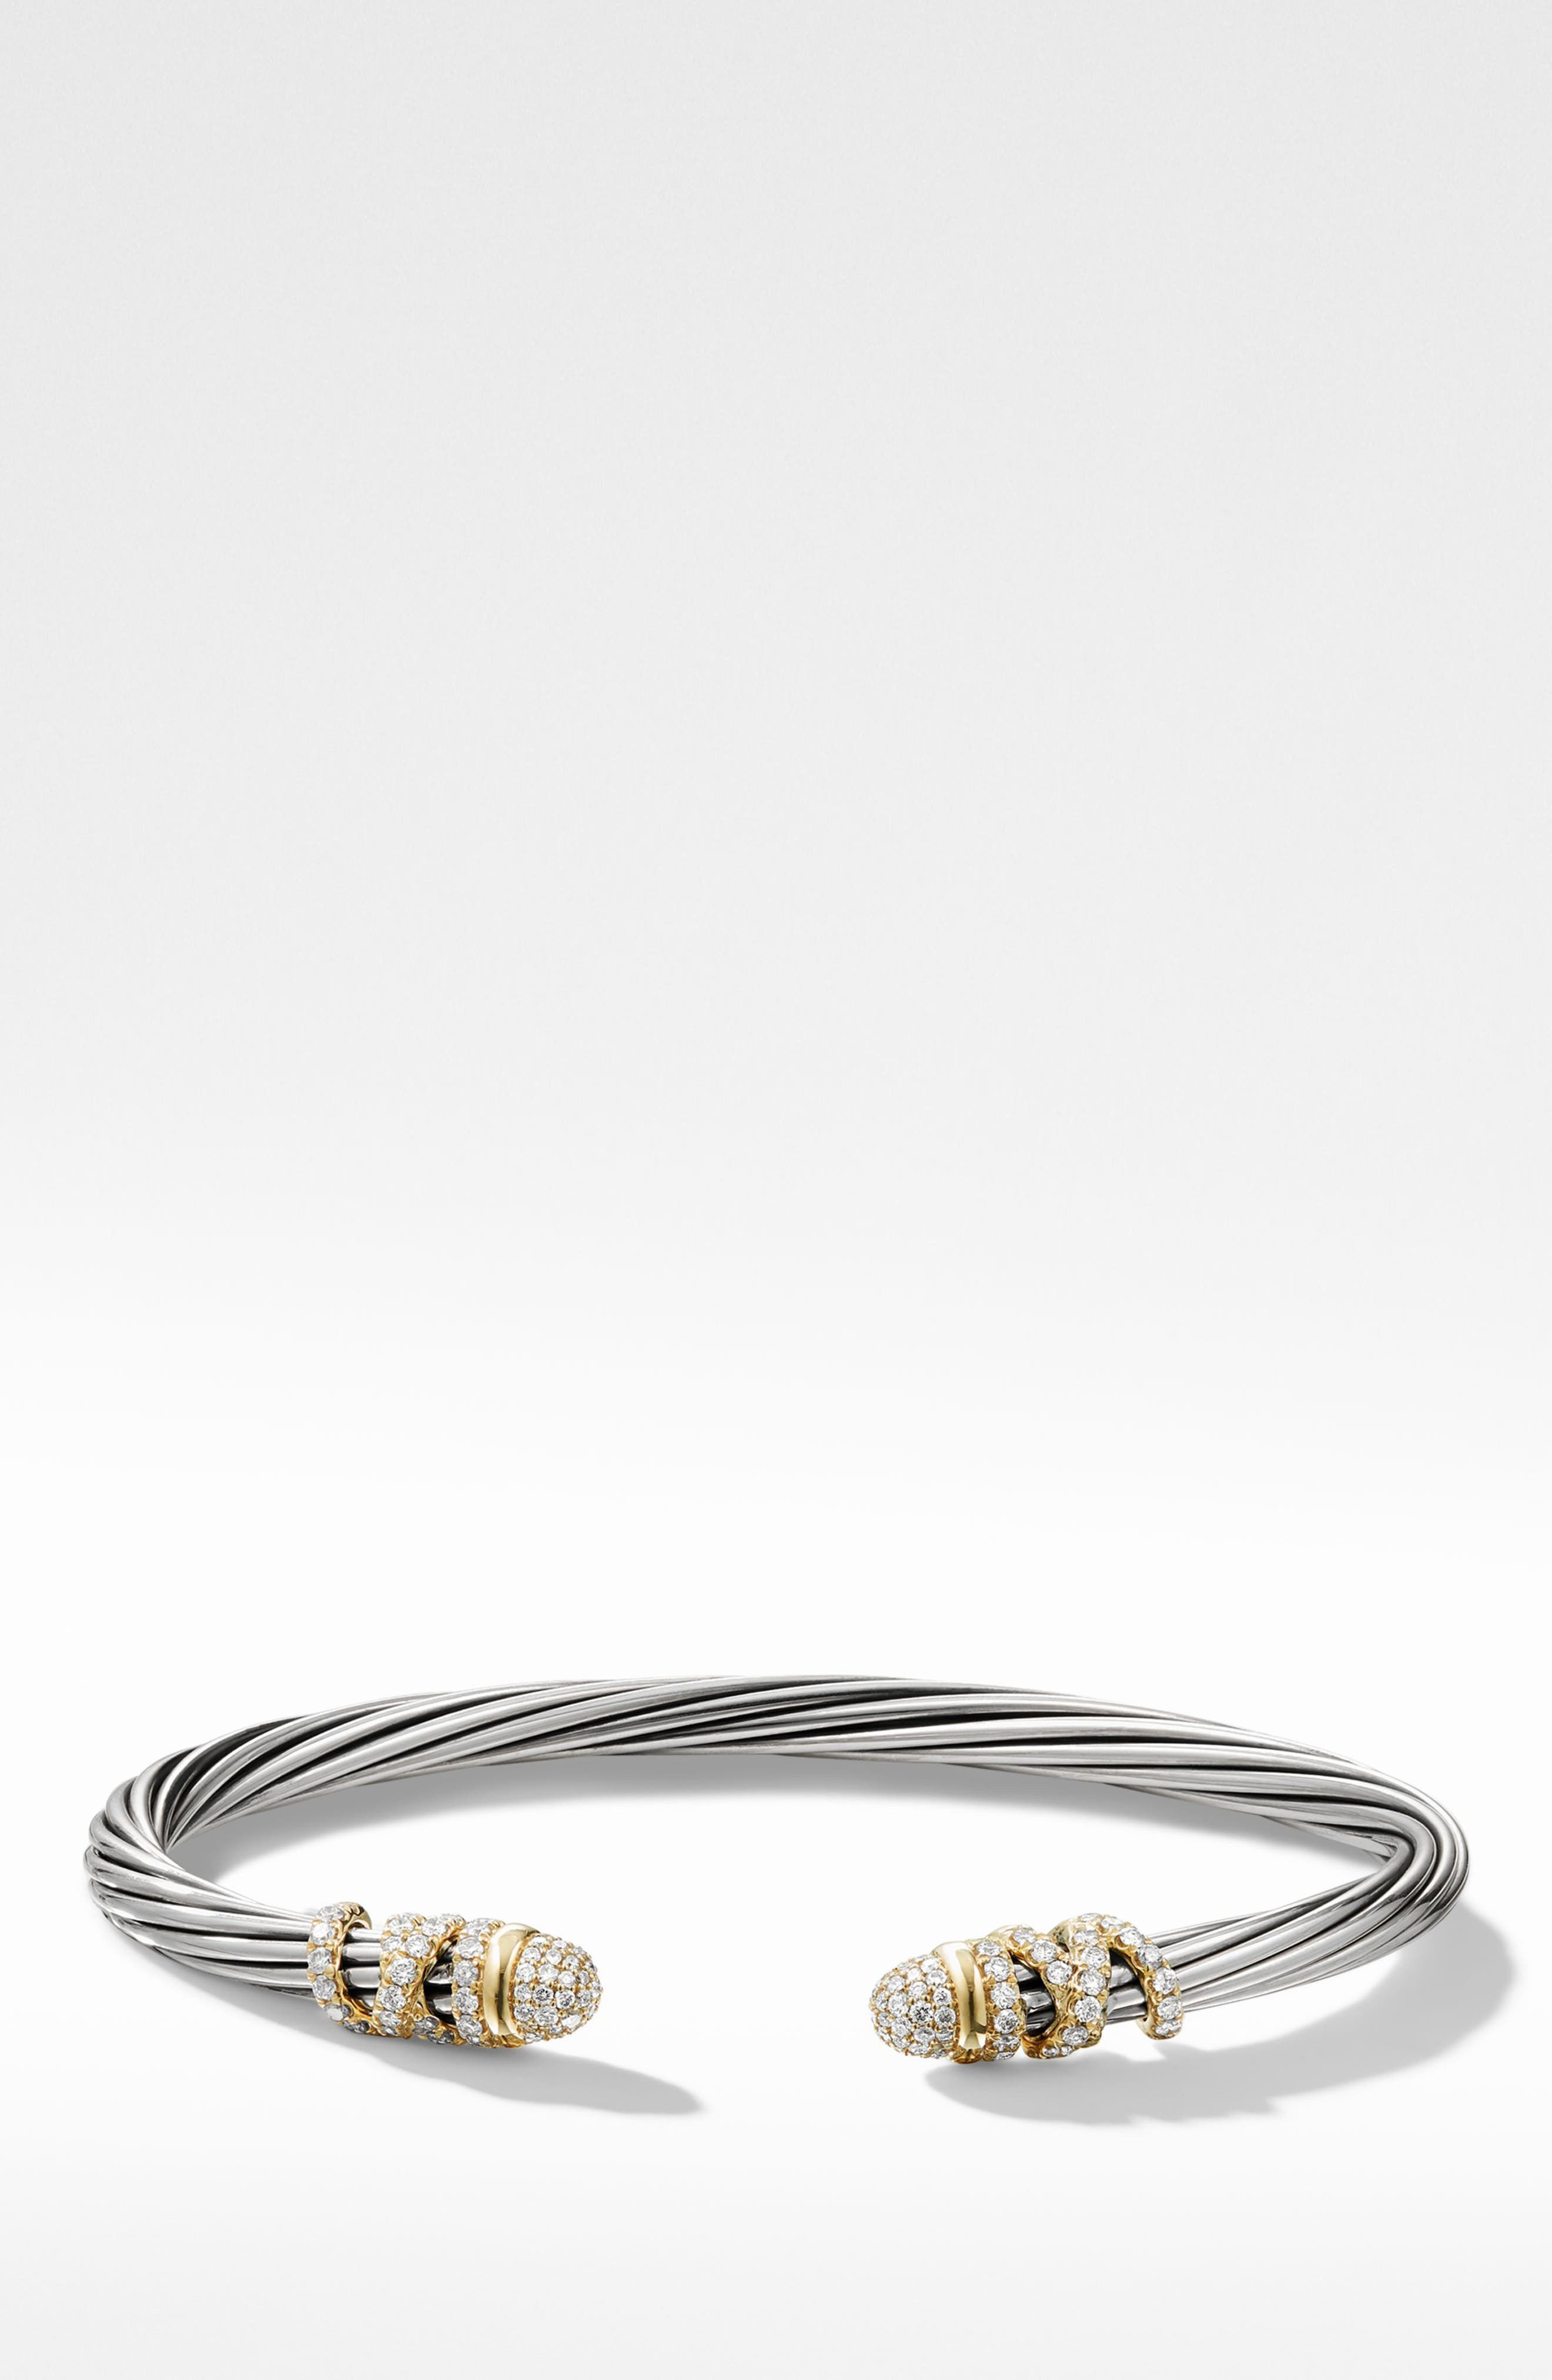 Helena Bracelet with Diamonds,                             Main thumbnail 1, color,                             GOLD/ SILVER/ DIAMOND